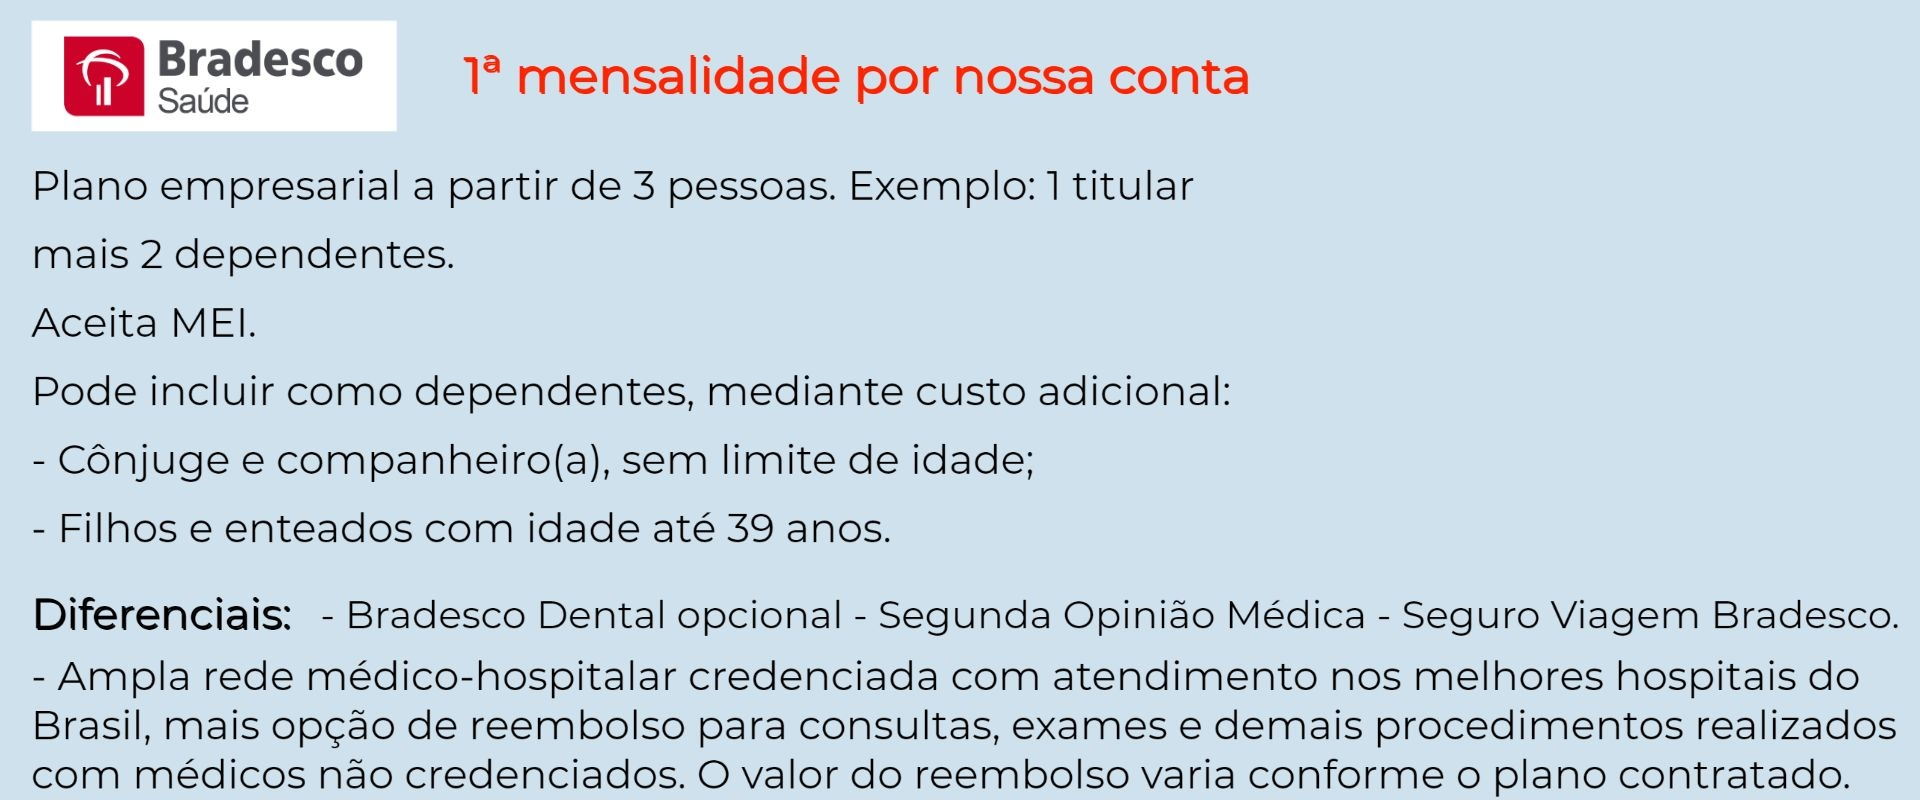 Bradesco Saúde Empresarial - Guarapari